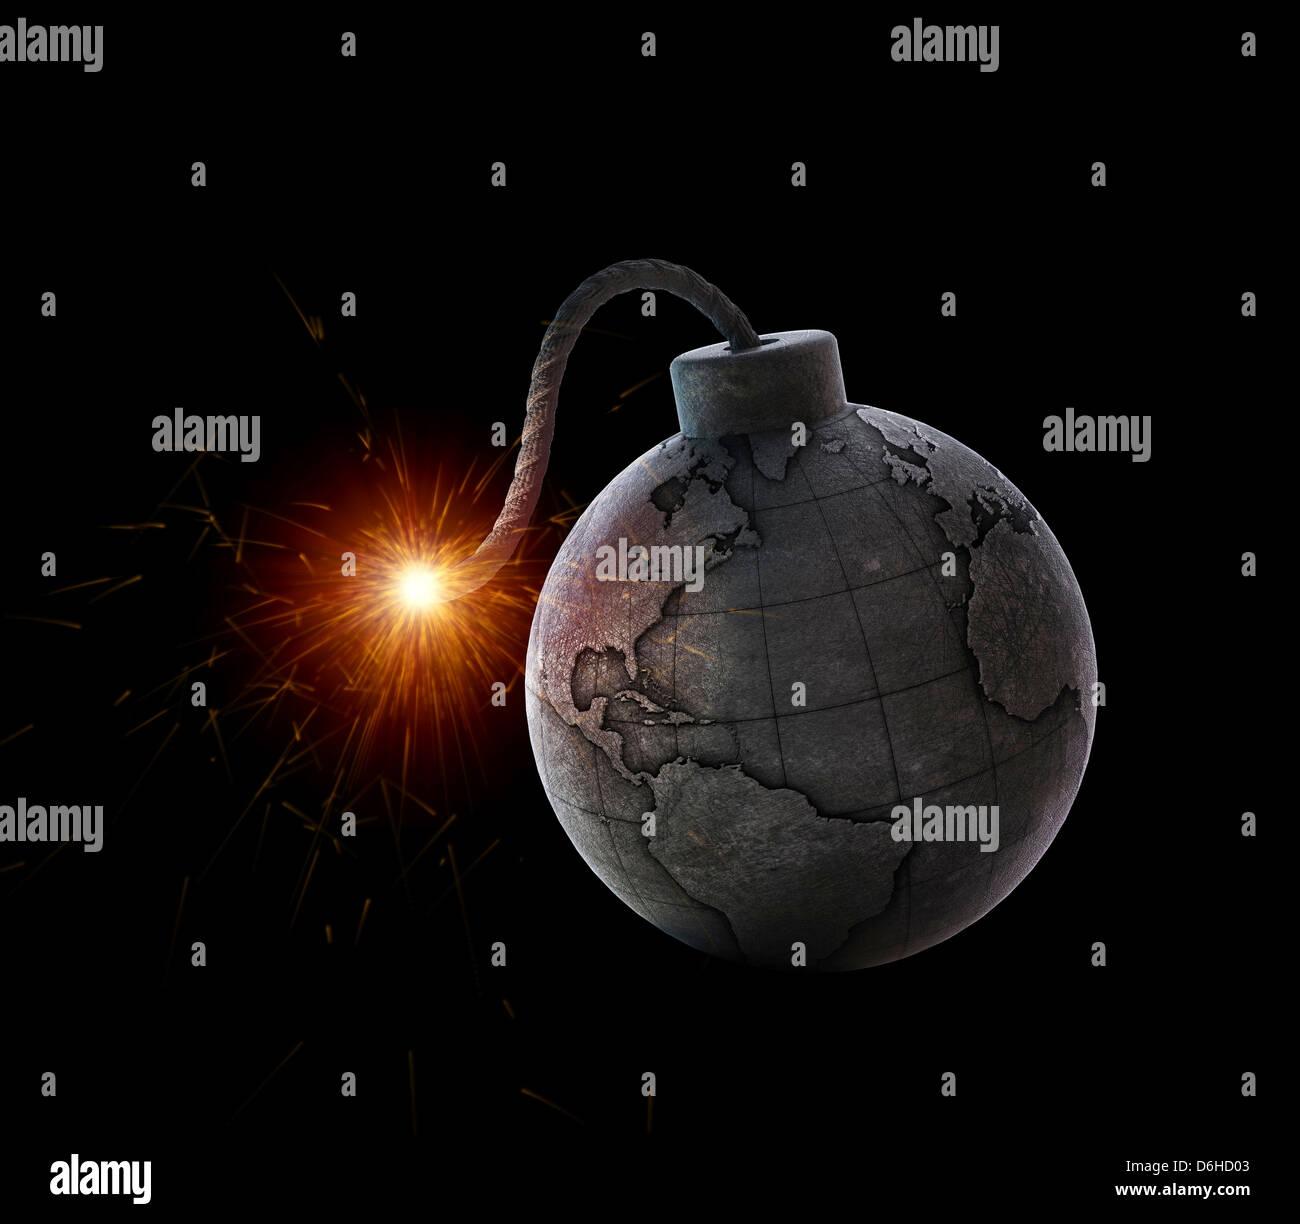 International crisis, conceptual artwork - Stock Image